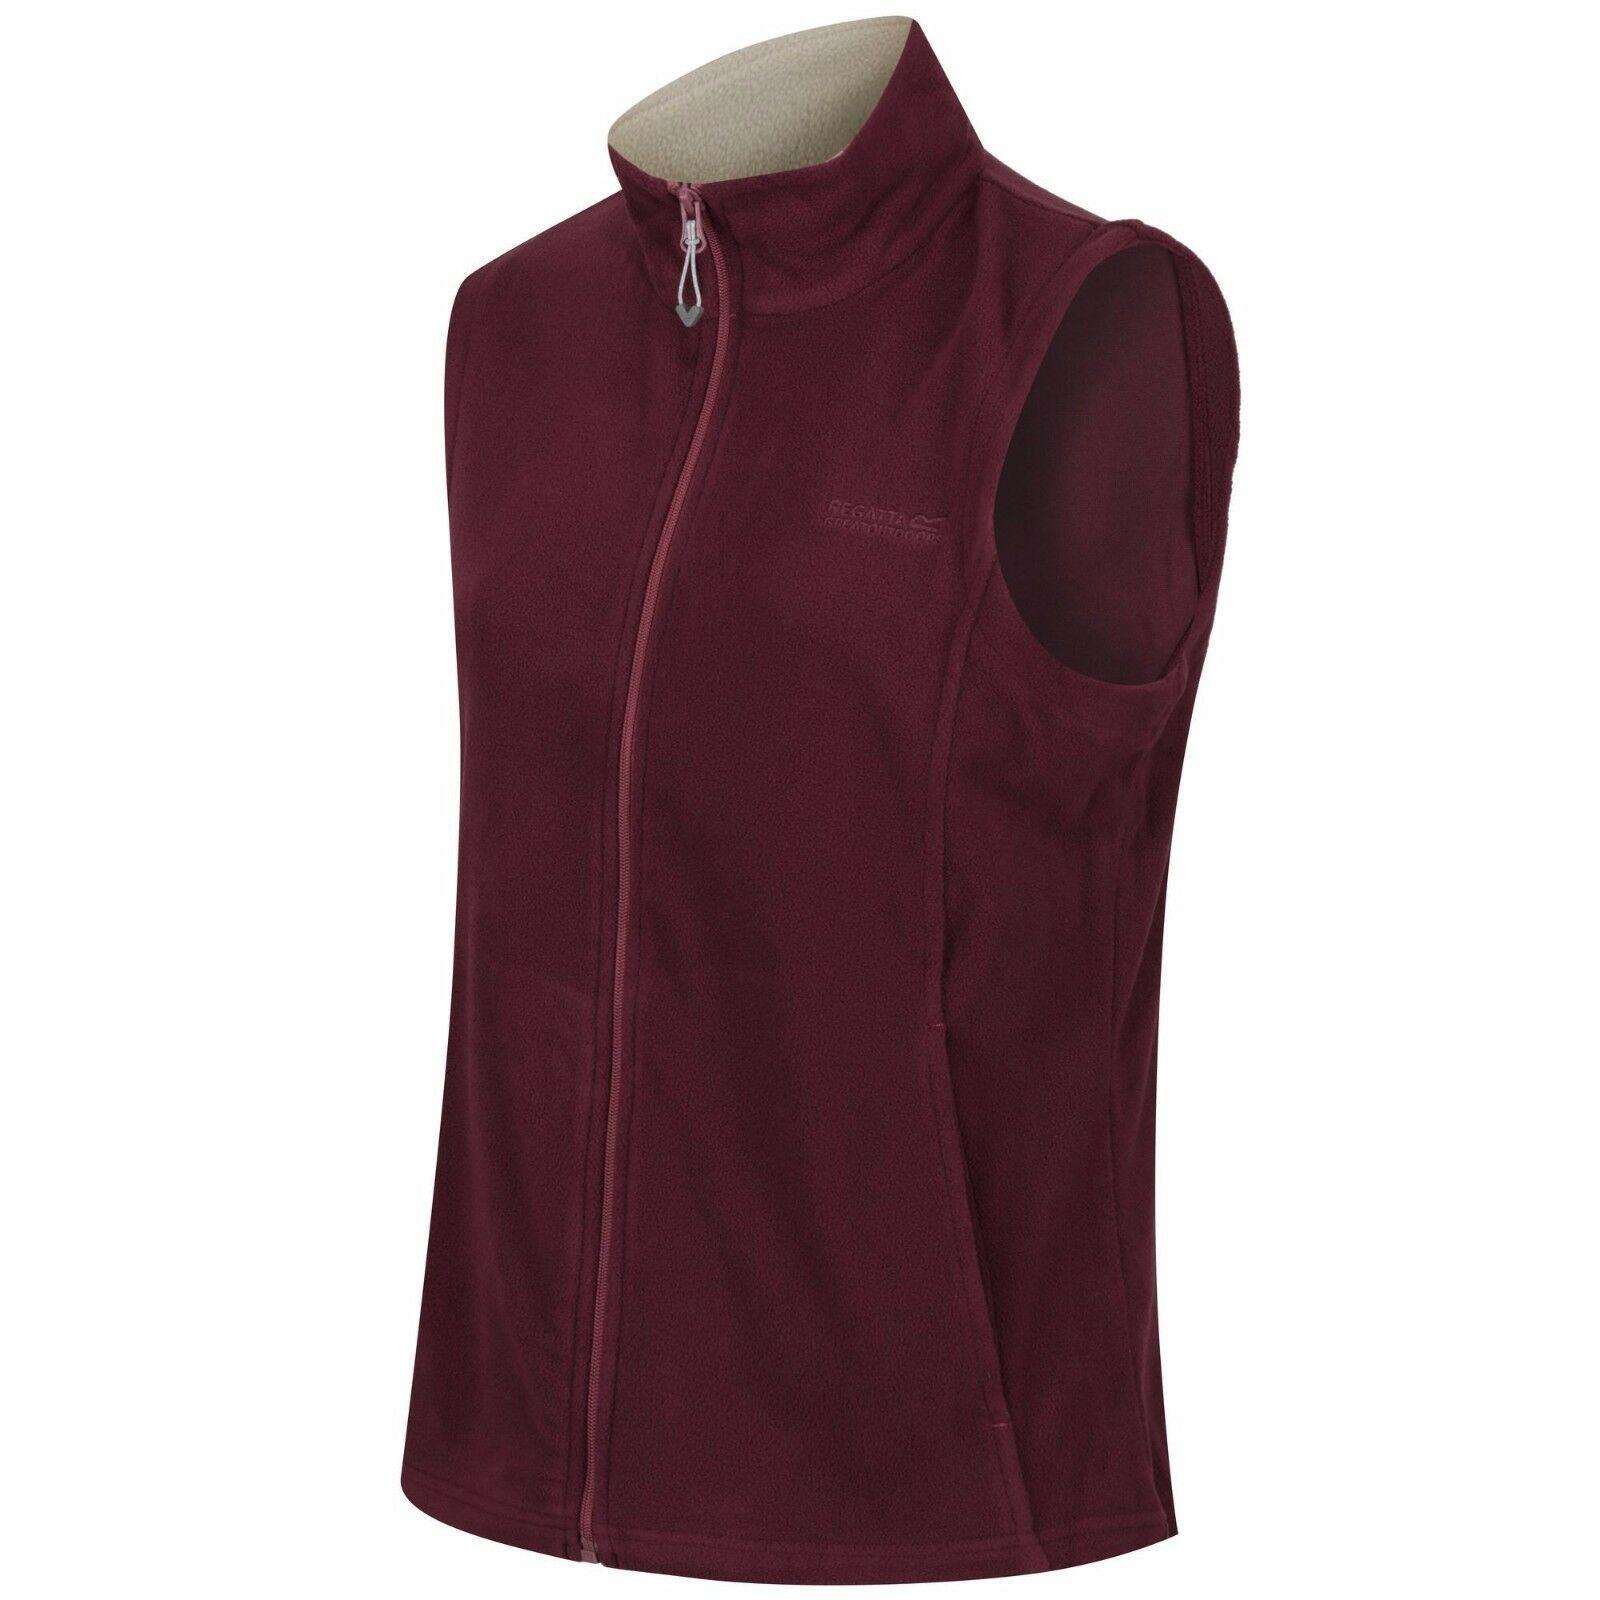 miniatuur 12 - Regatta Womens Sweetness Full Zip Micro Fleece Casual Bodywarmer Waistcoat